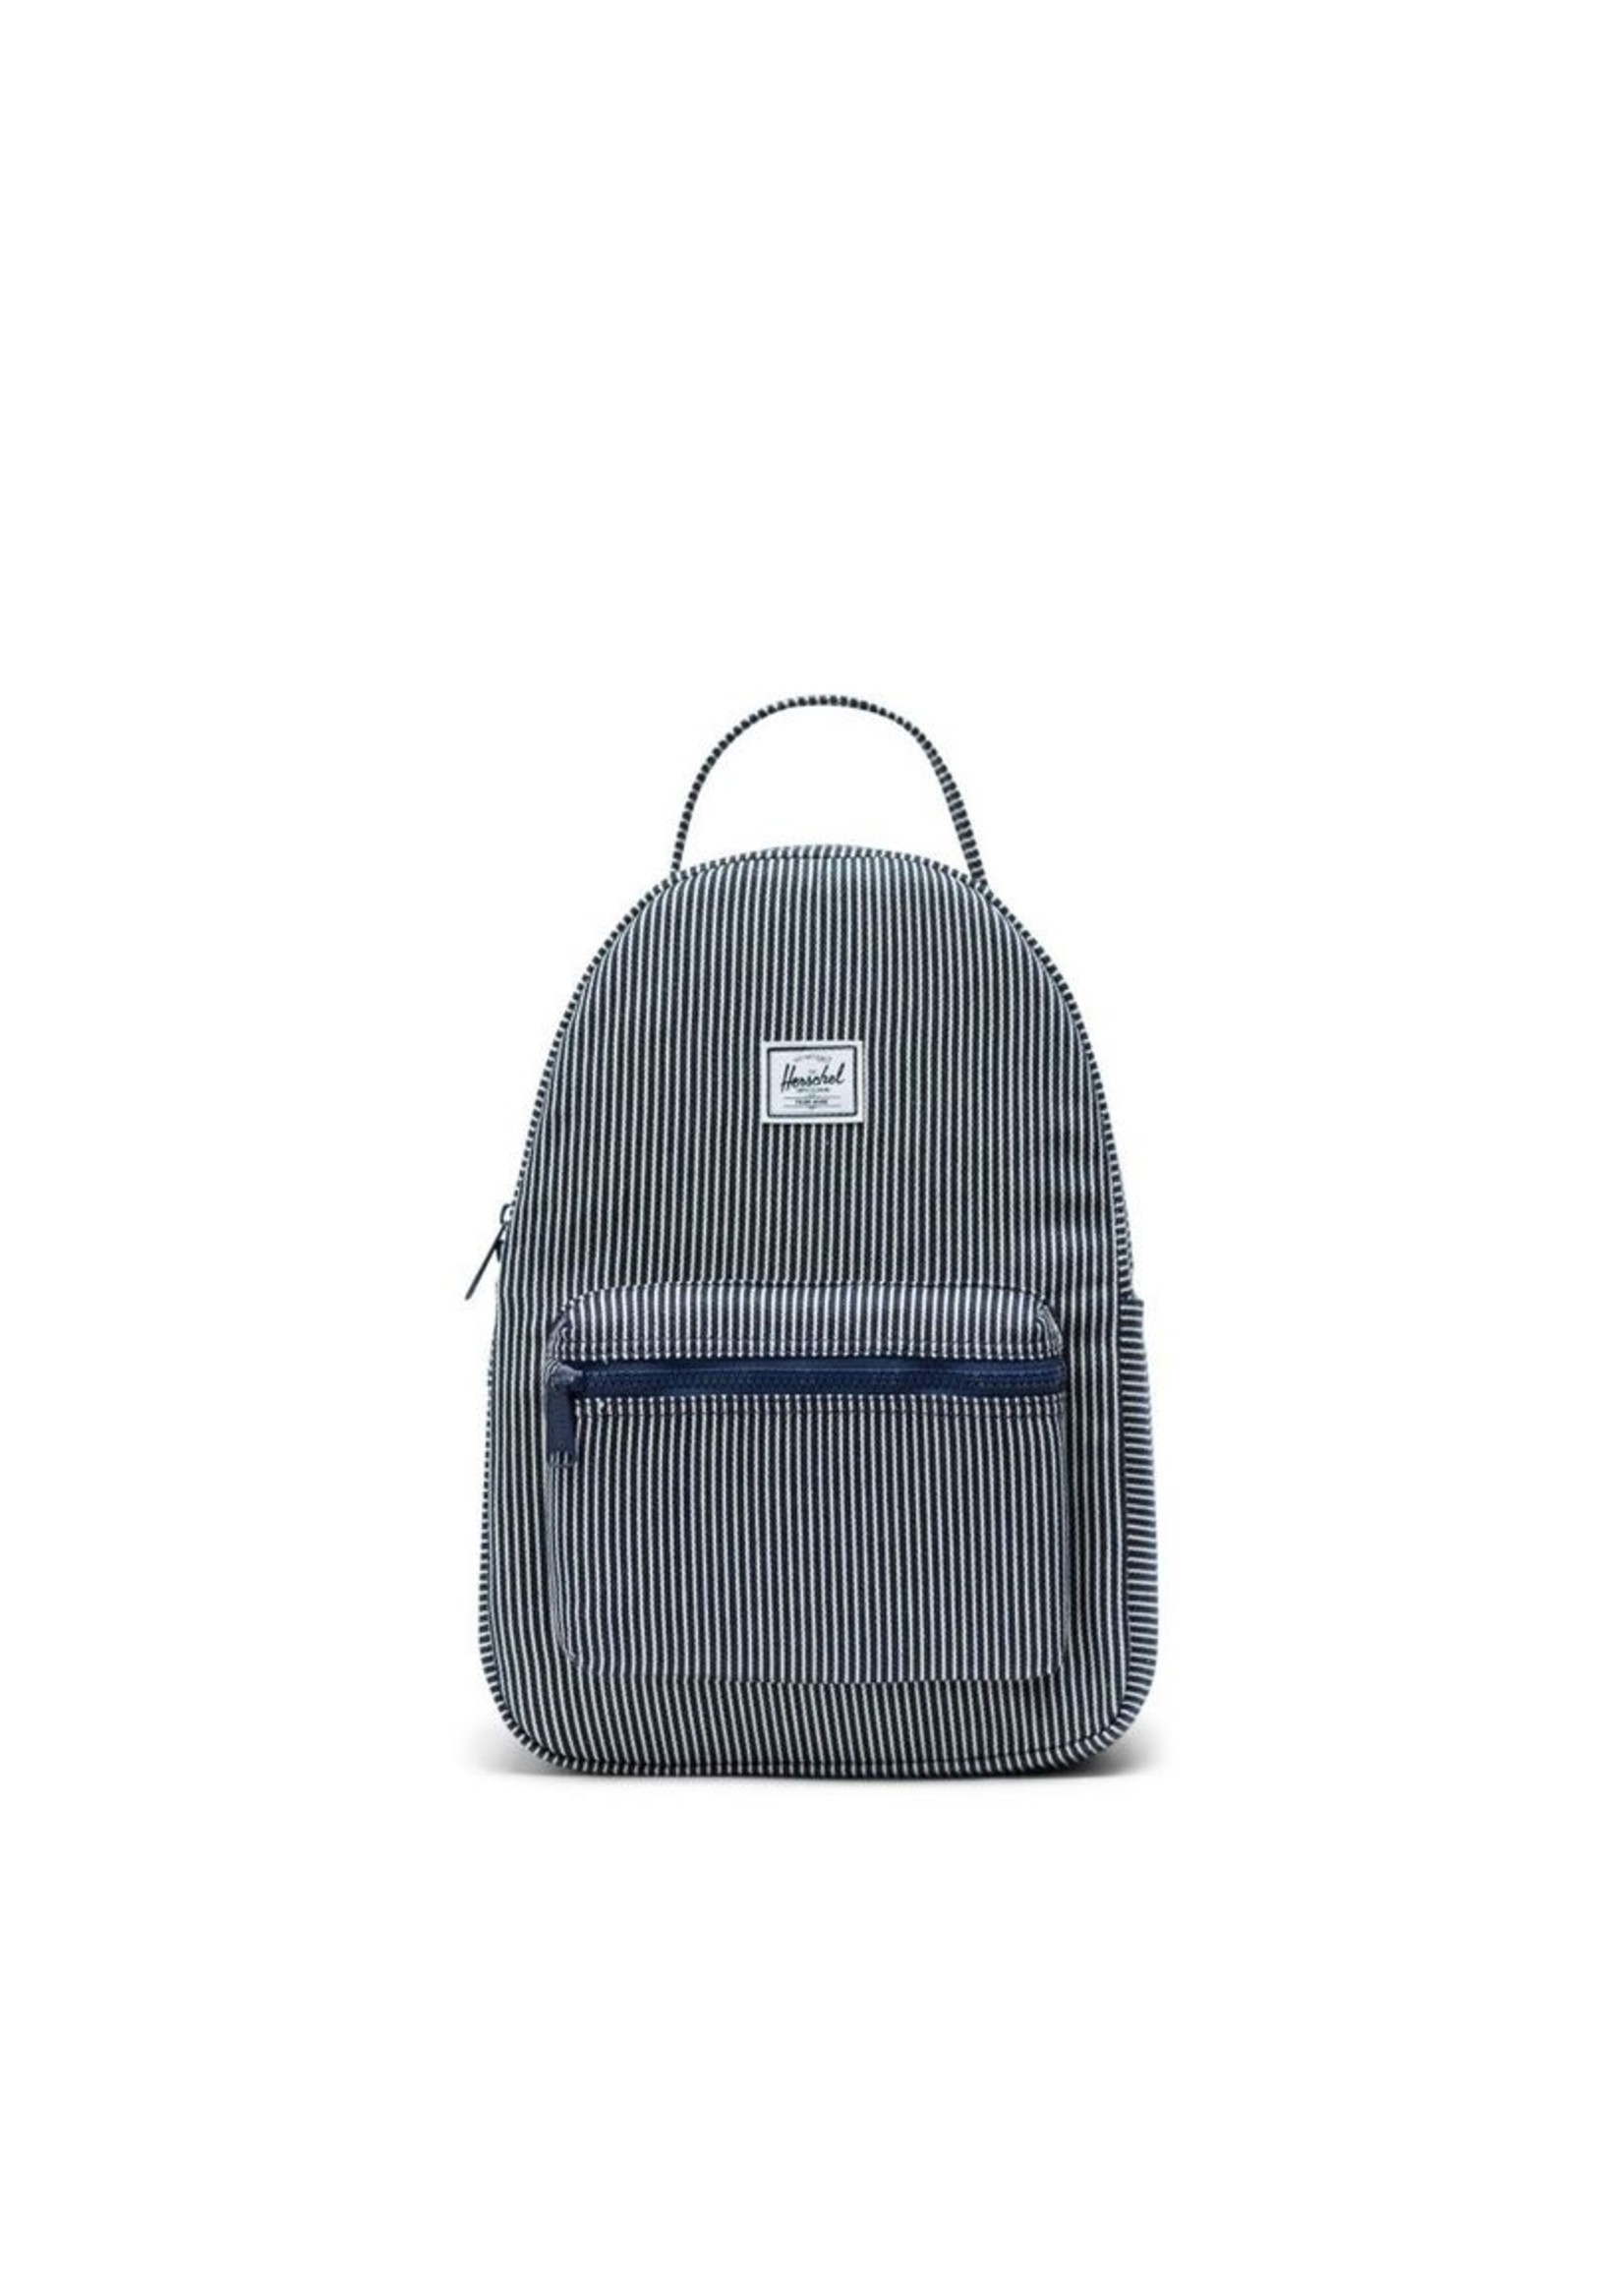 Herschel Supply Co. Herschel Supply, Nova Small Cotton Casuals Collection Backpack